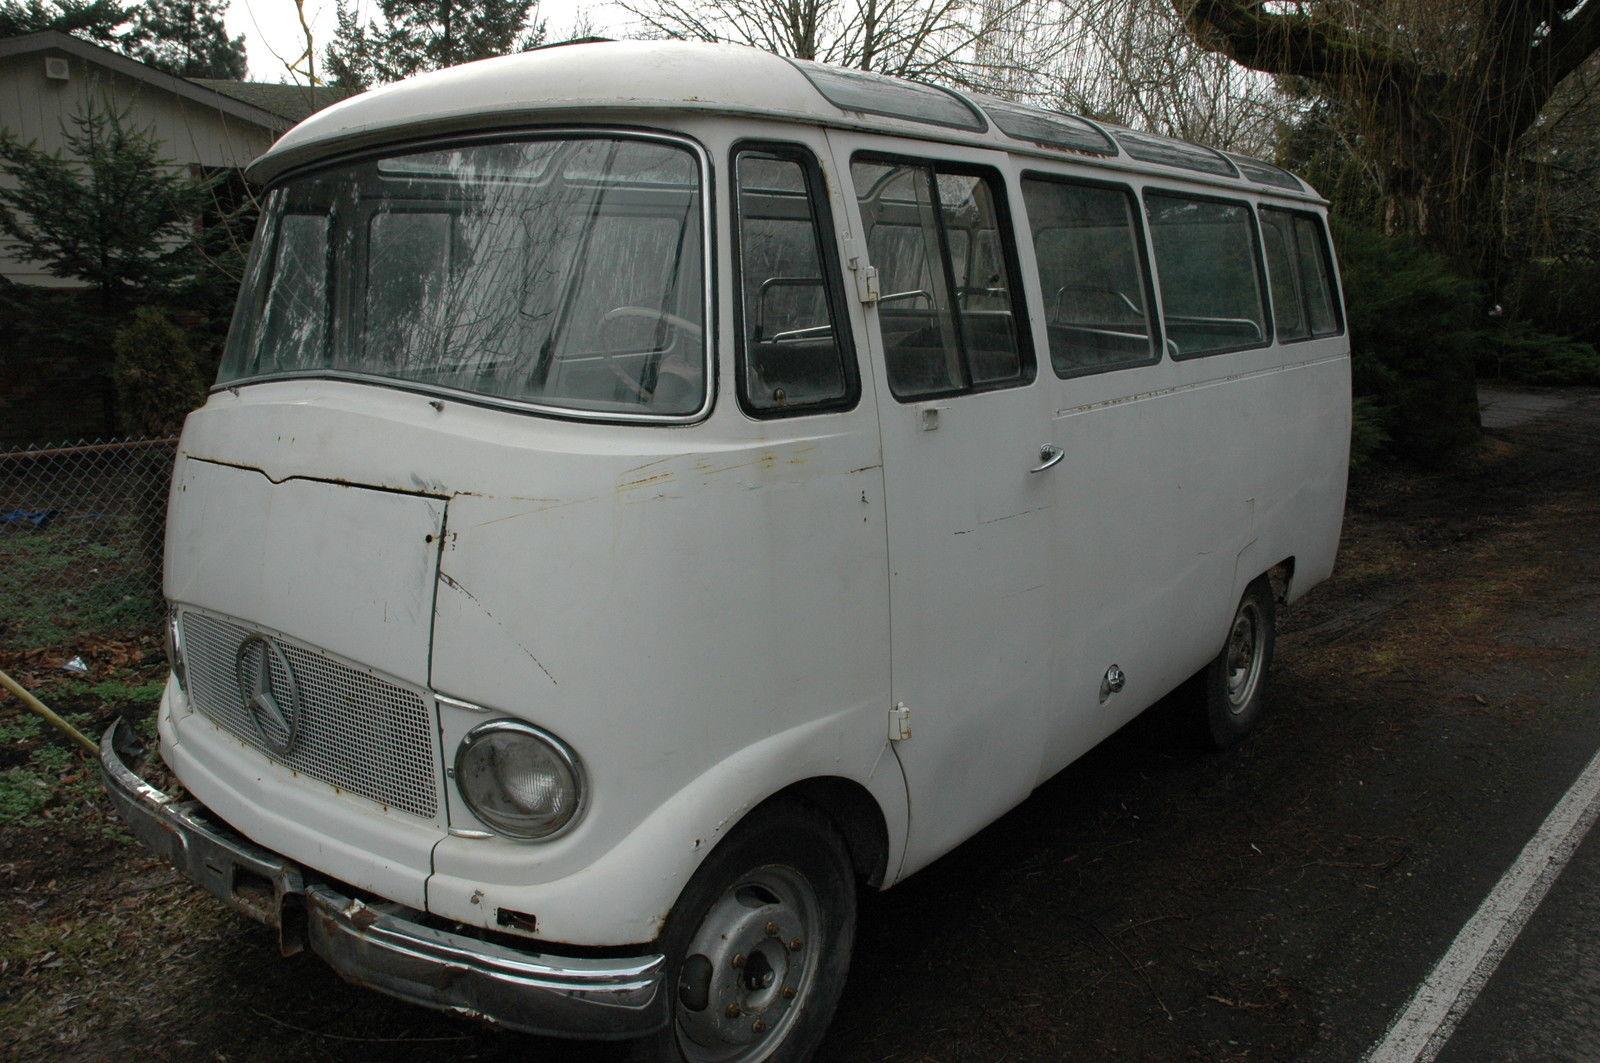 1960 mercedes benz o319d 319 panorama bus ultra rare for Mercedes benz 319 bus for sale